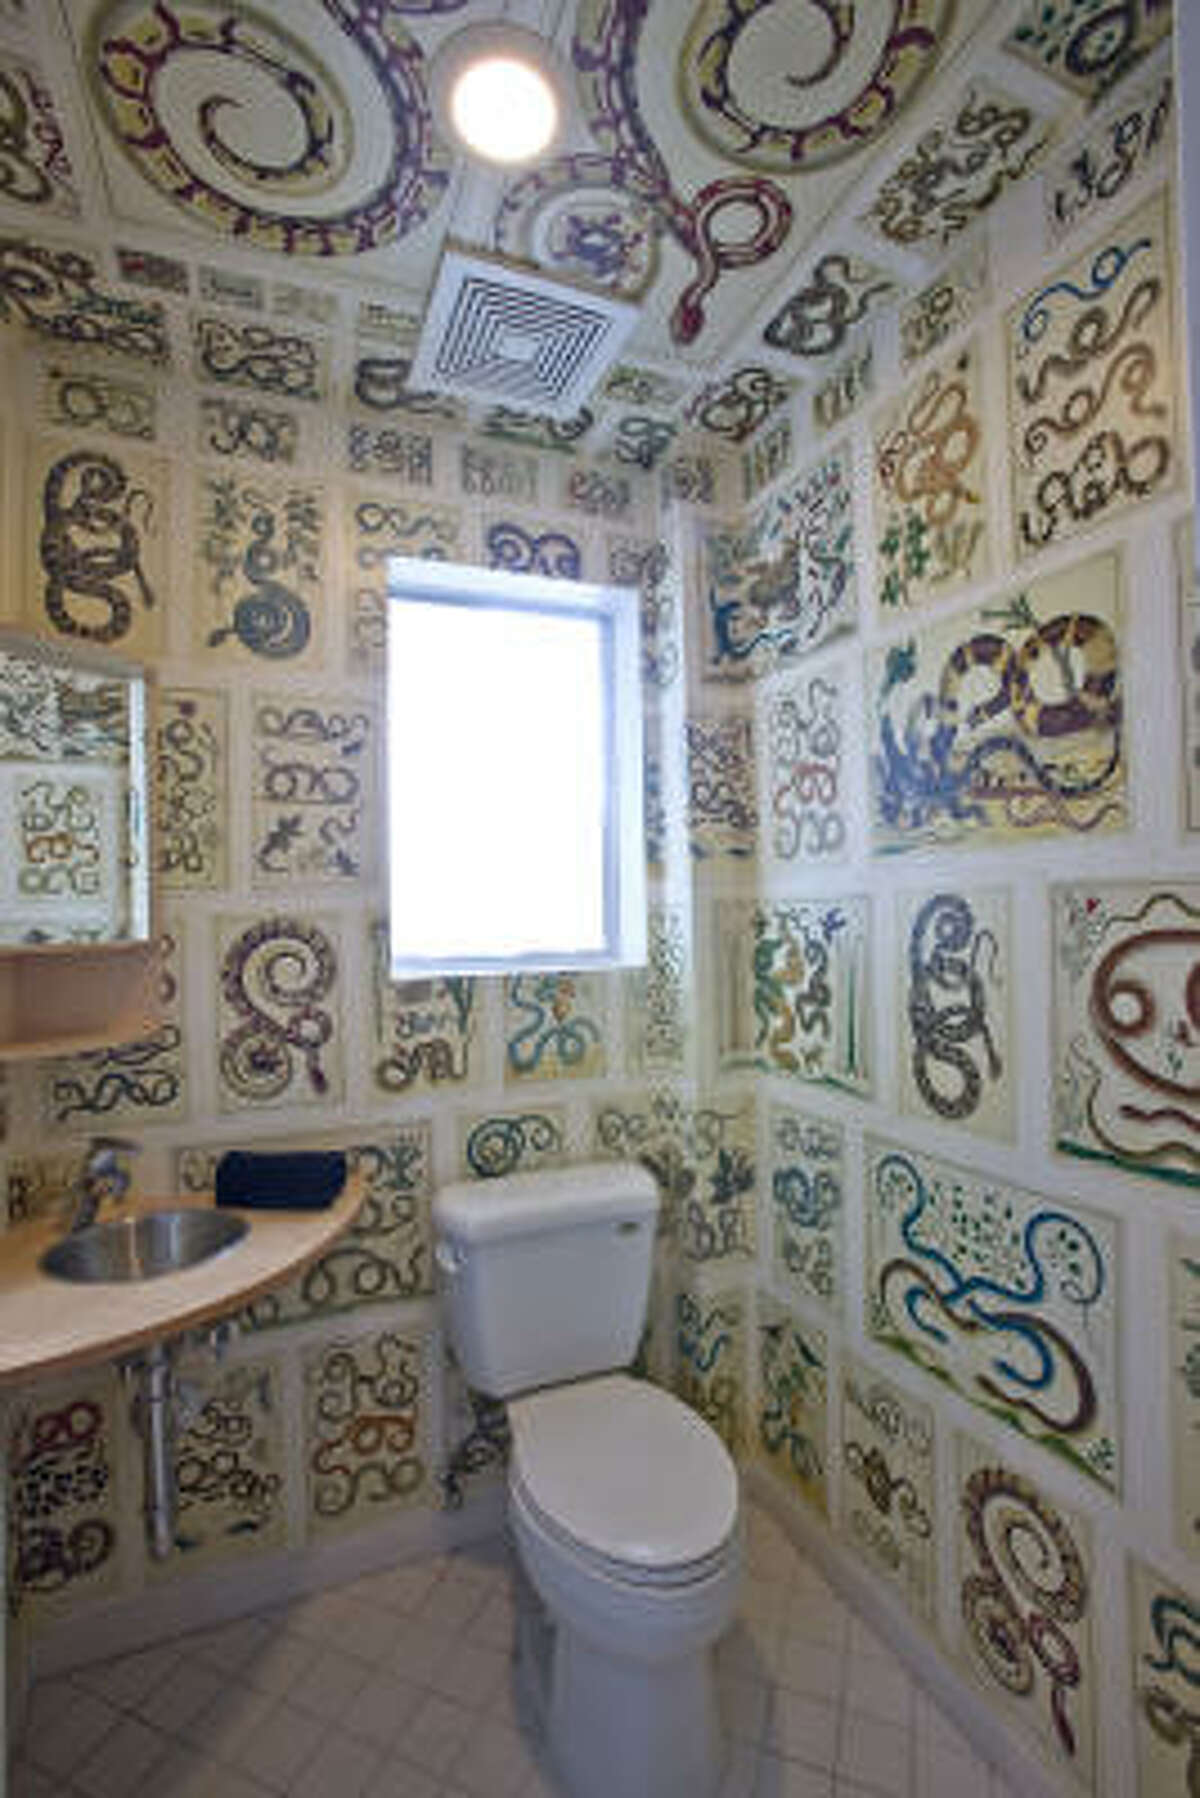 Interior designer David Stone created slithery walls for photographer Joe Aker's bathroom.